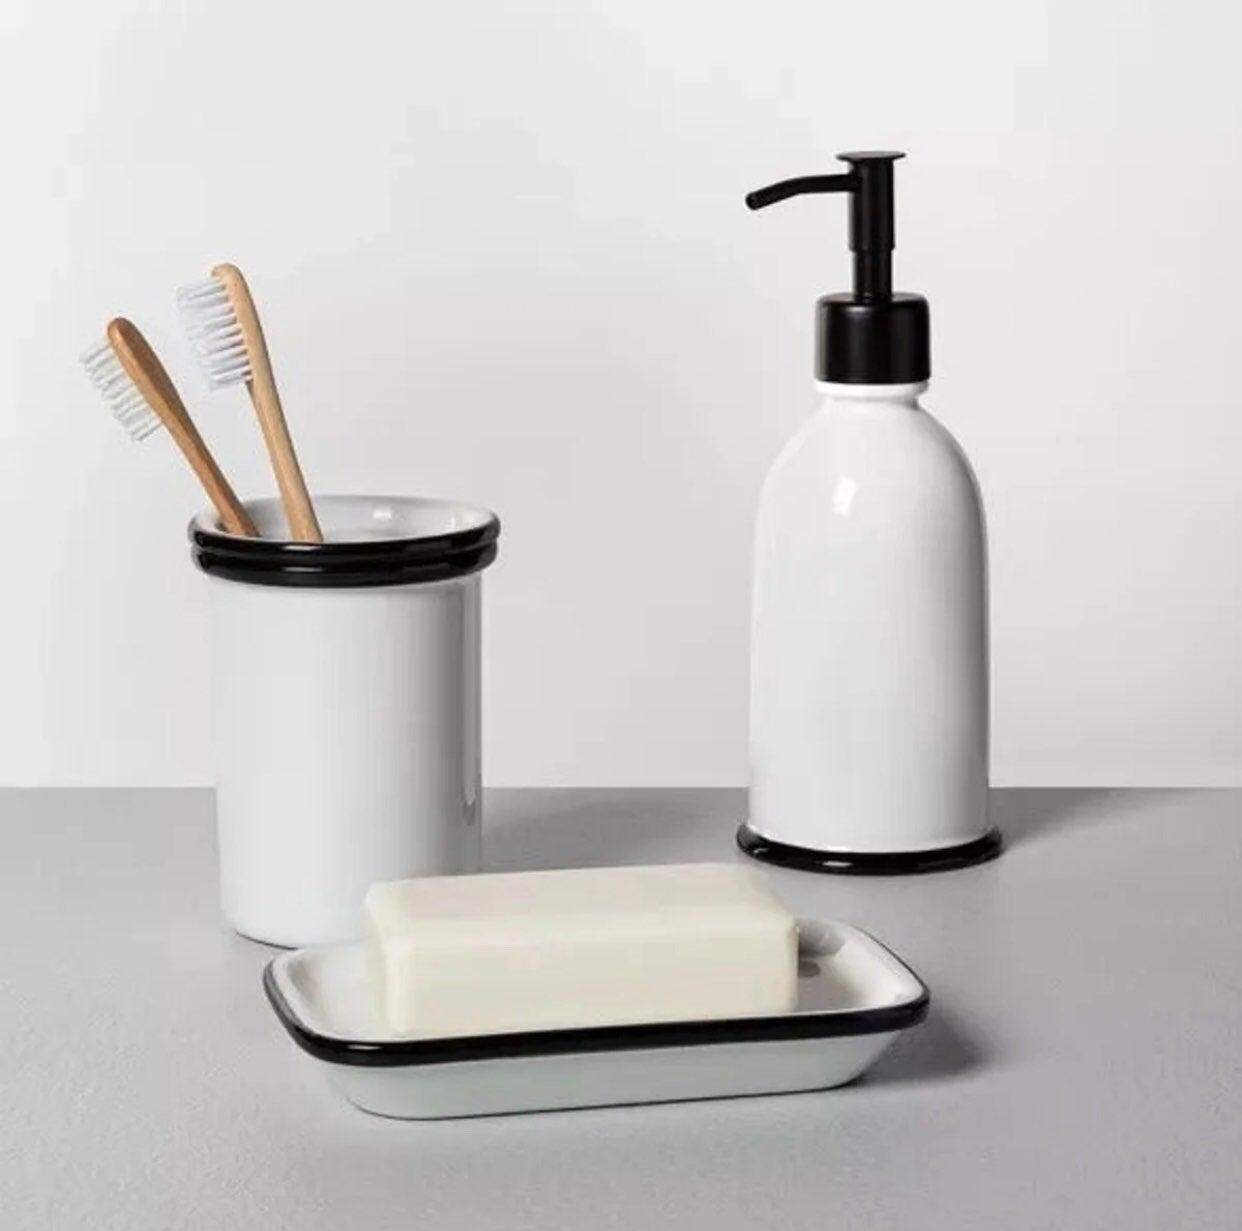 Hearth & Hand 3pc Bath Set white & black